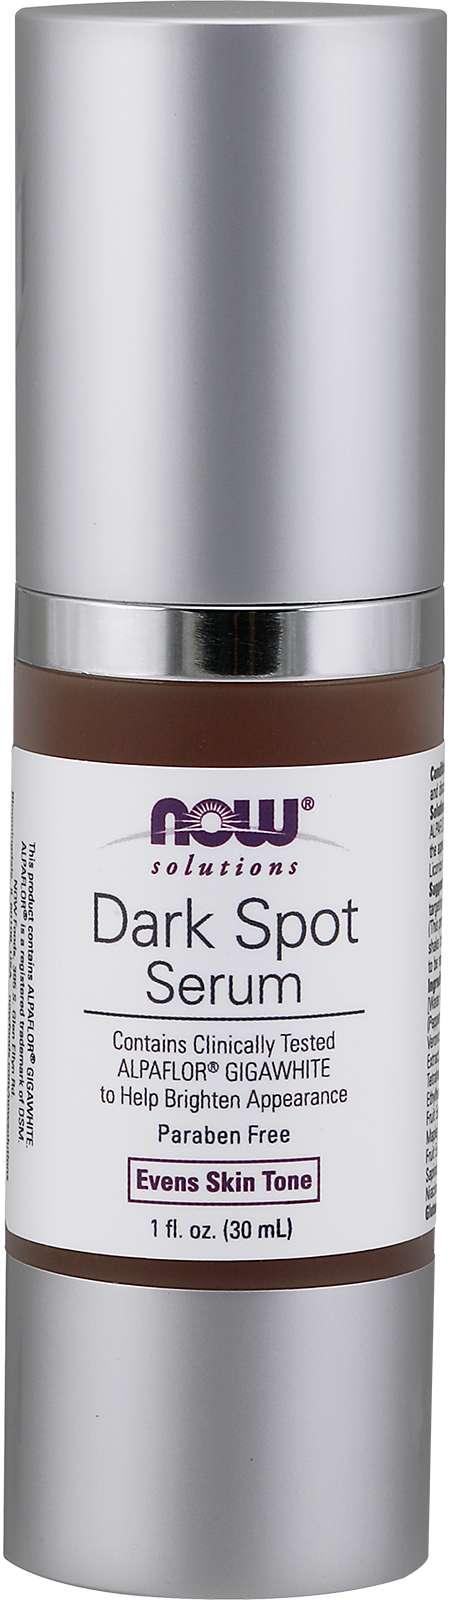 Dark Spot Serum - Evens Skin Tone 30mL